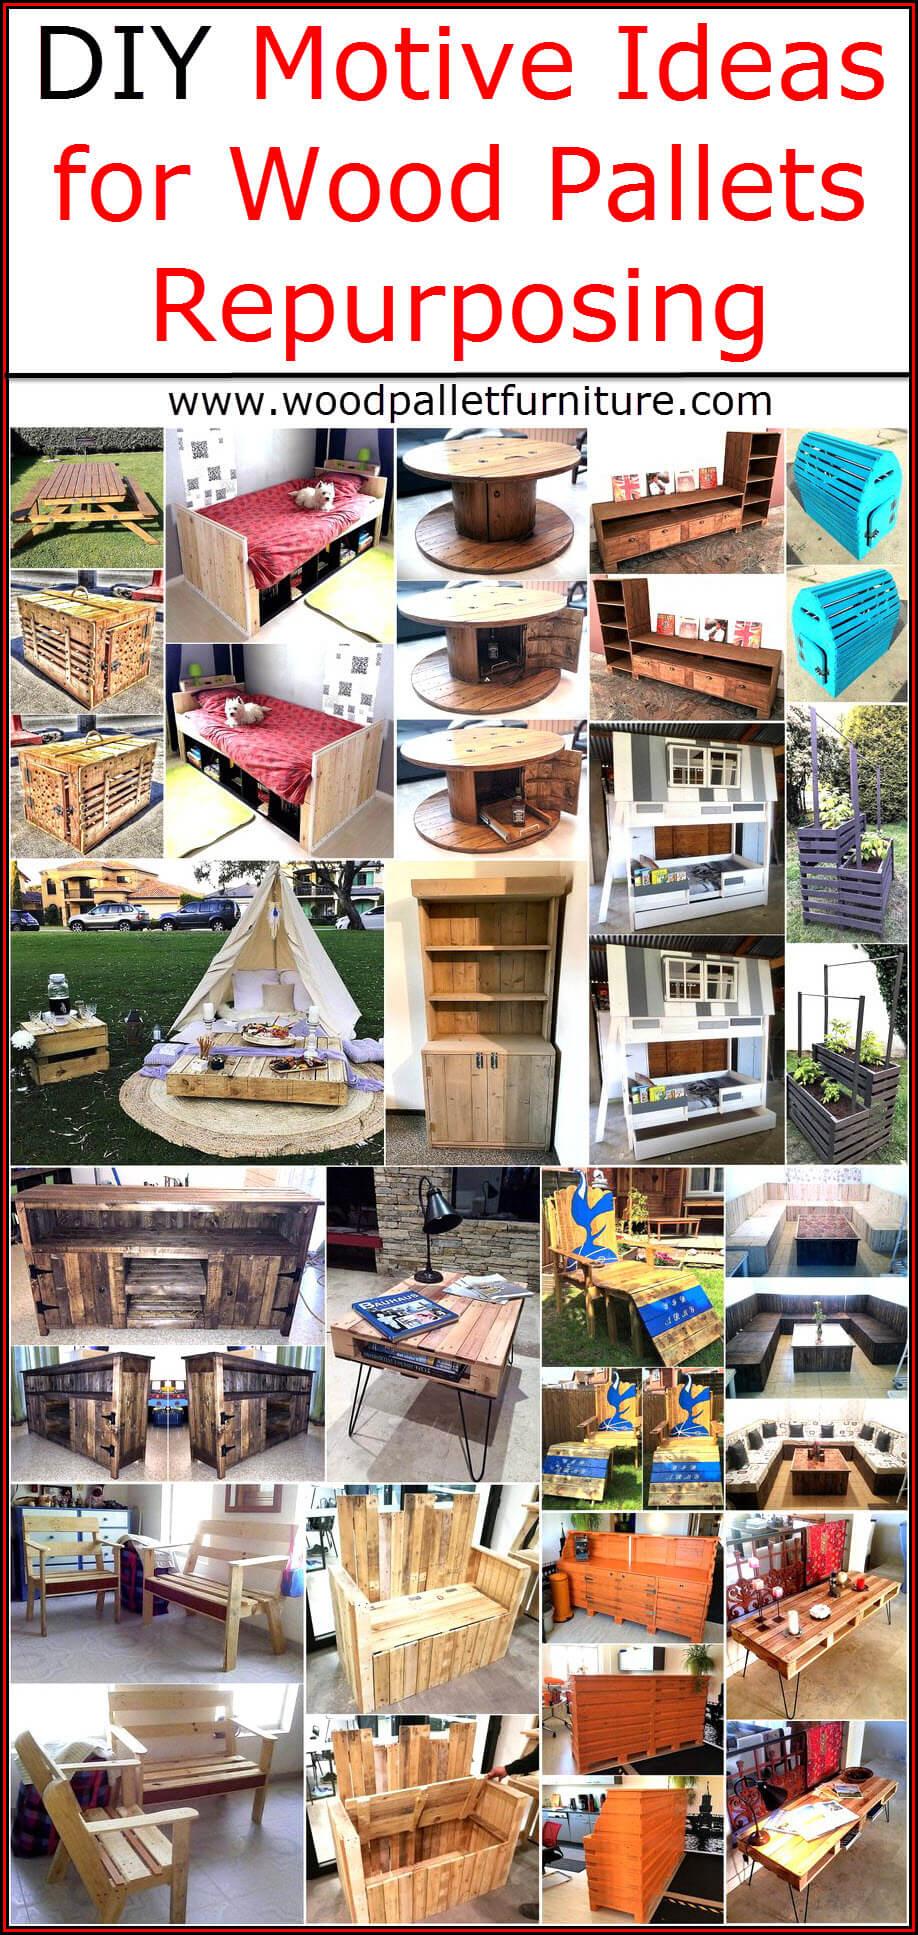 DIY Motive Ideas for Wood Pallets Repurposing